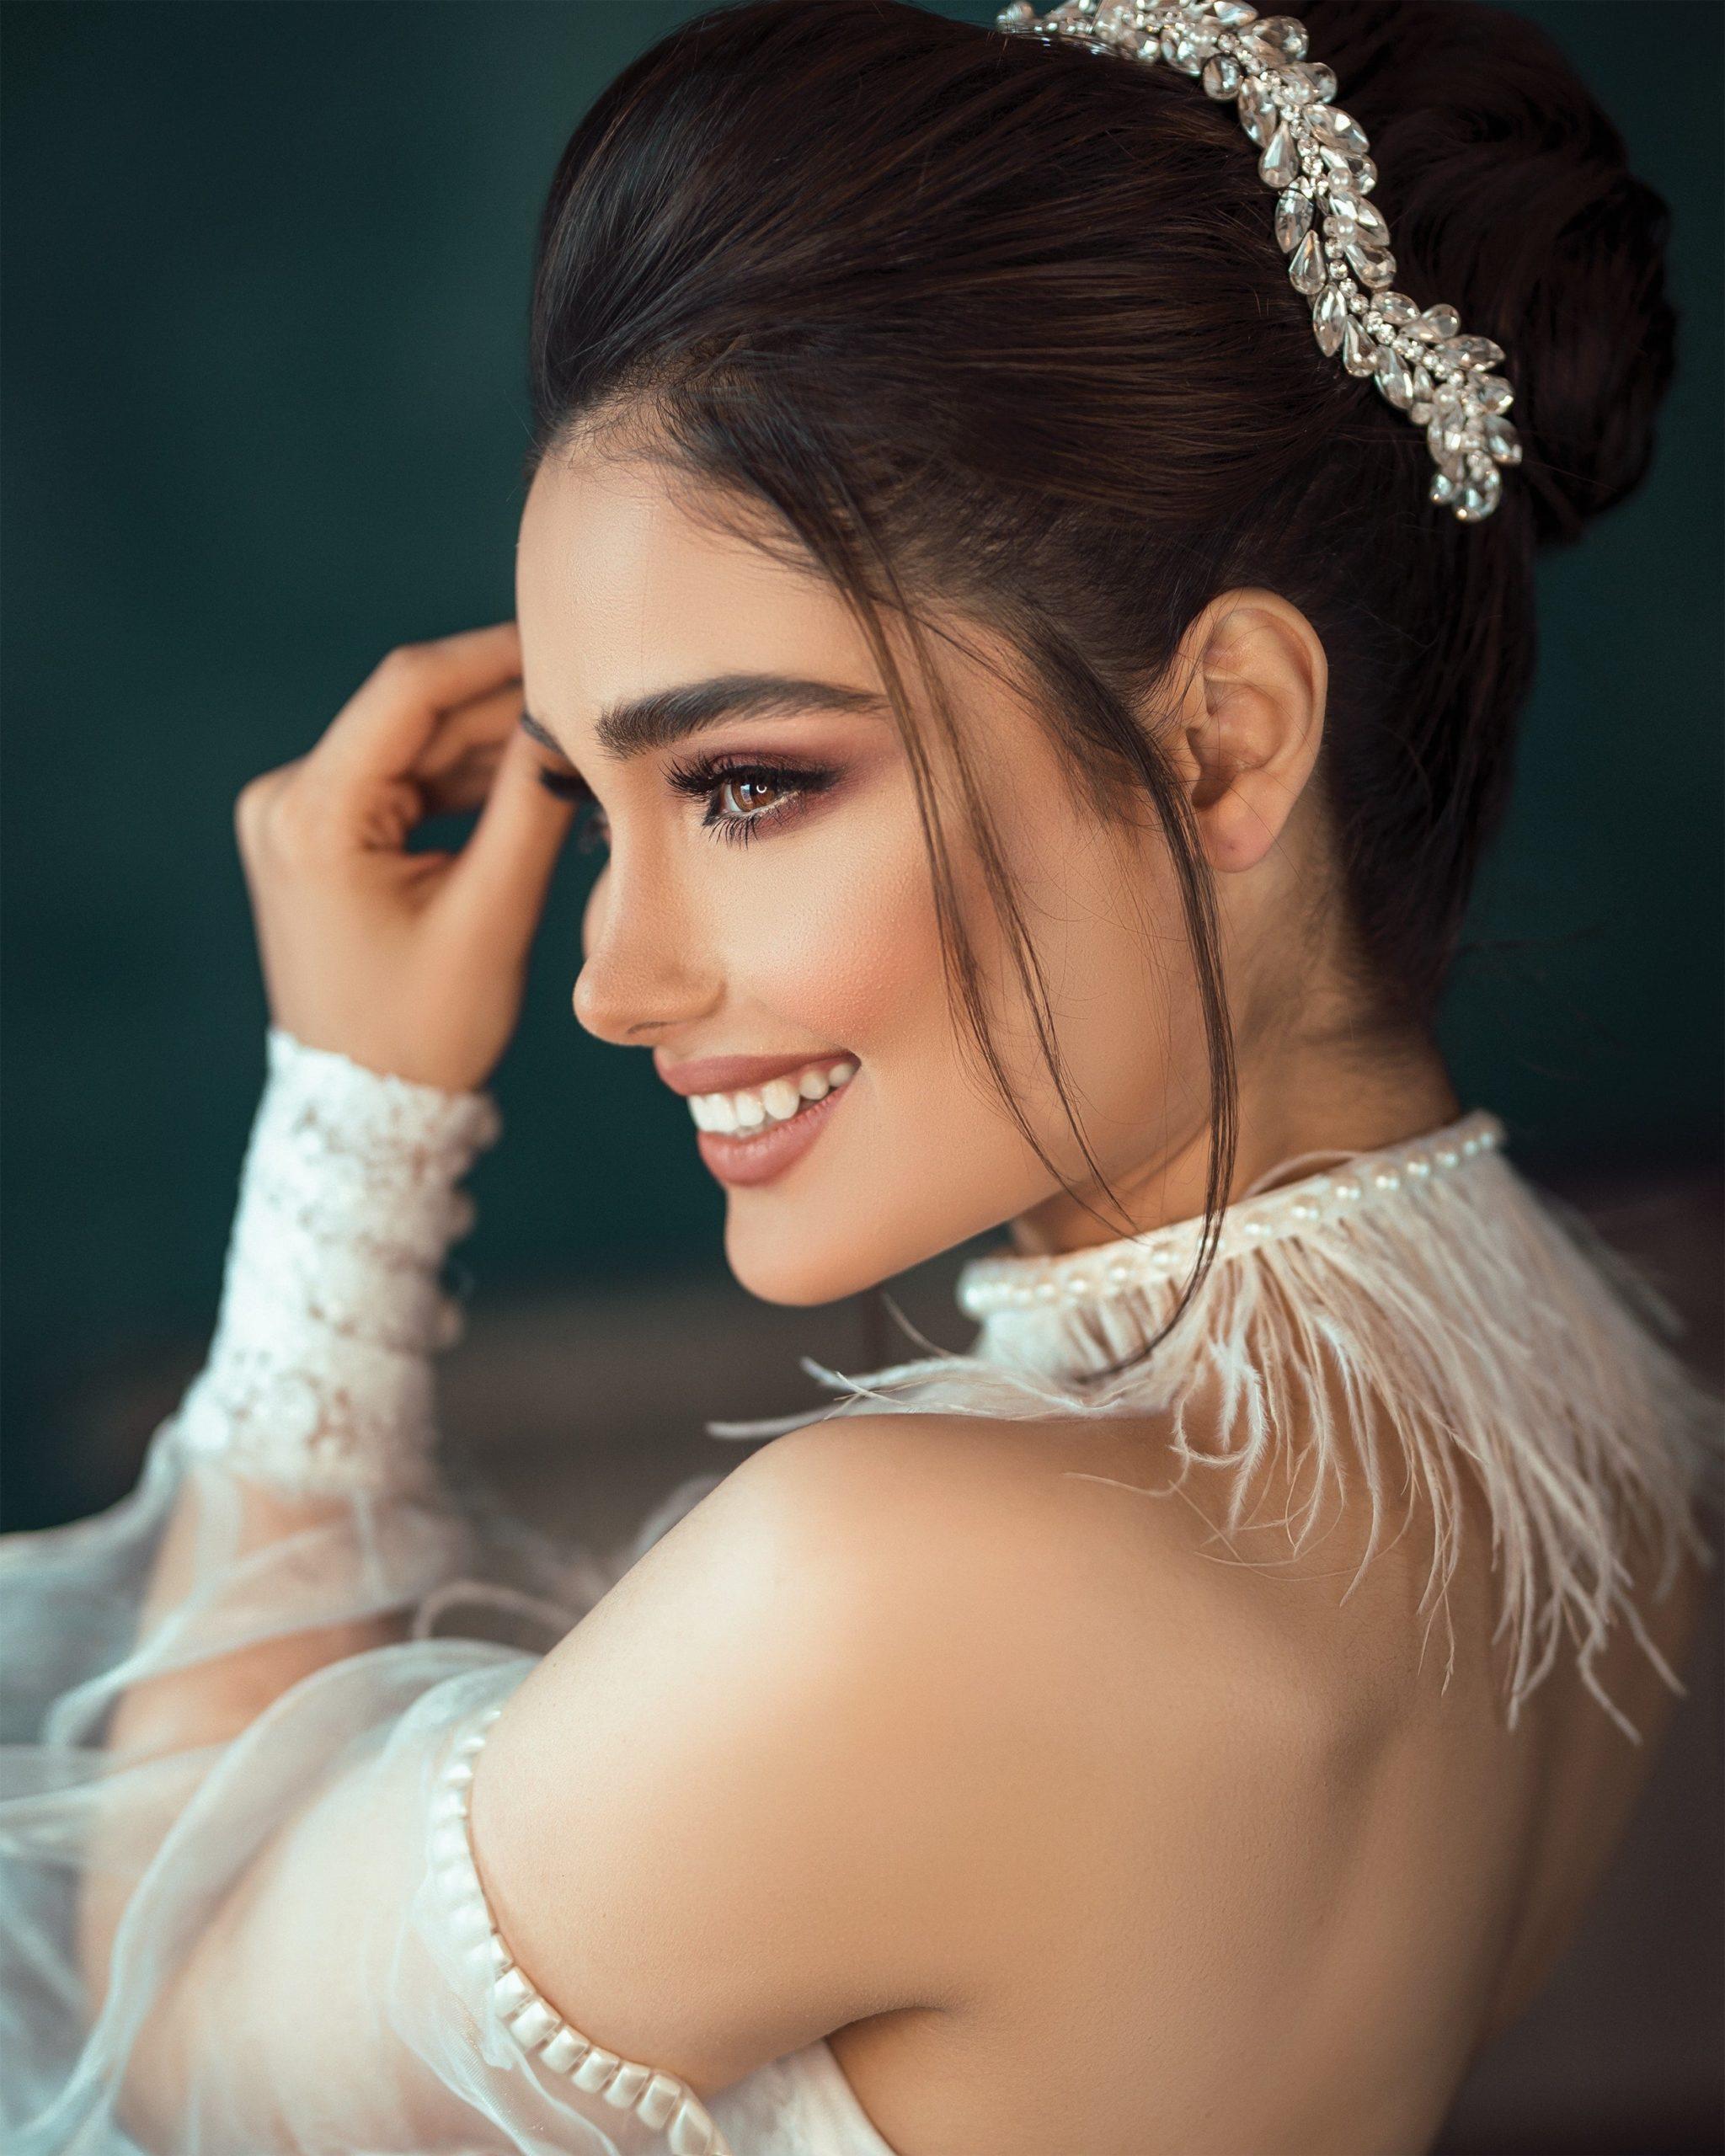 woman smiling, wearing defined makeup and tiara.